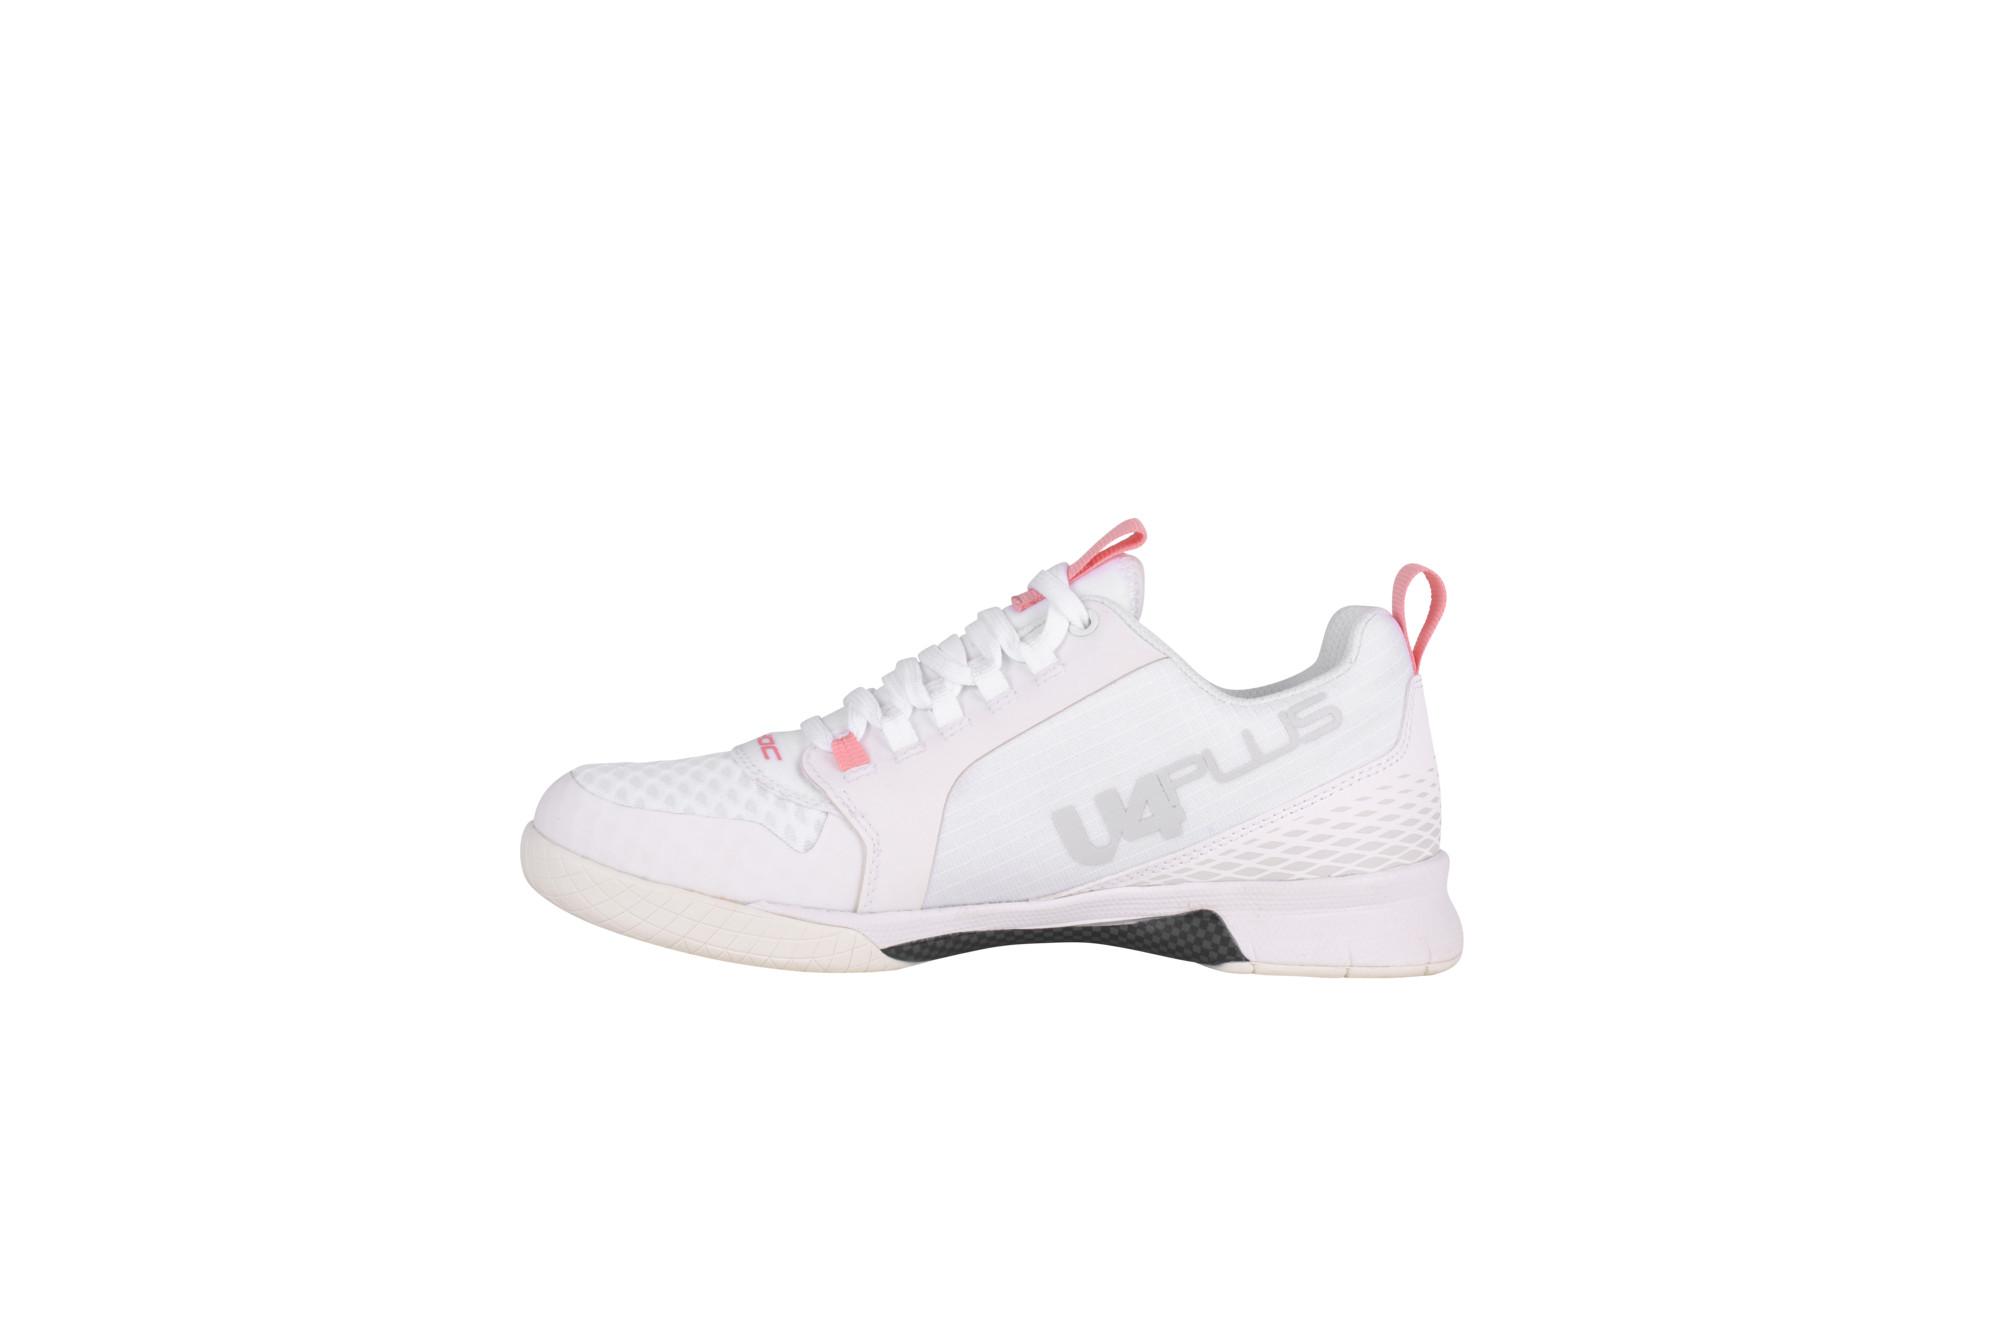 Unihoc Shoe U4 PLUS LowCut Lady white/pink UK 5, EU 38, US 6, 24 cm